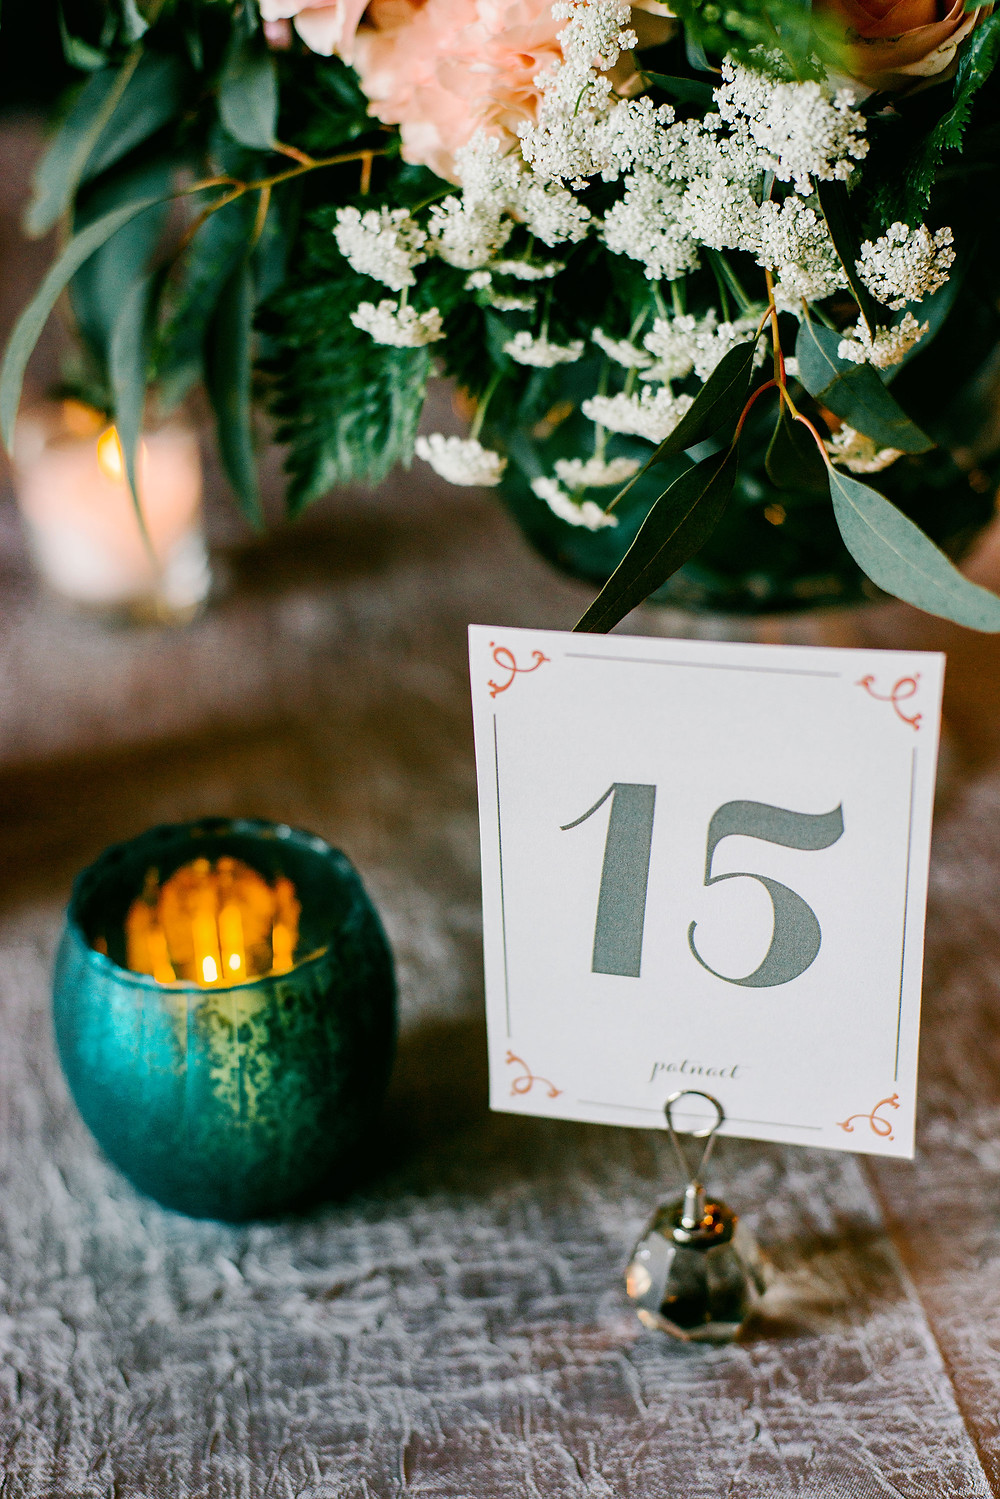 Denver Botanic Garden Wedding Florist - arrangements